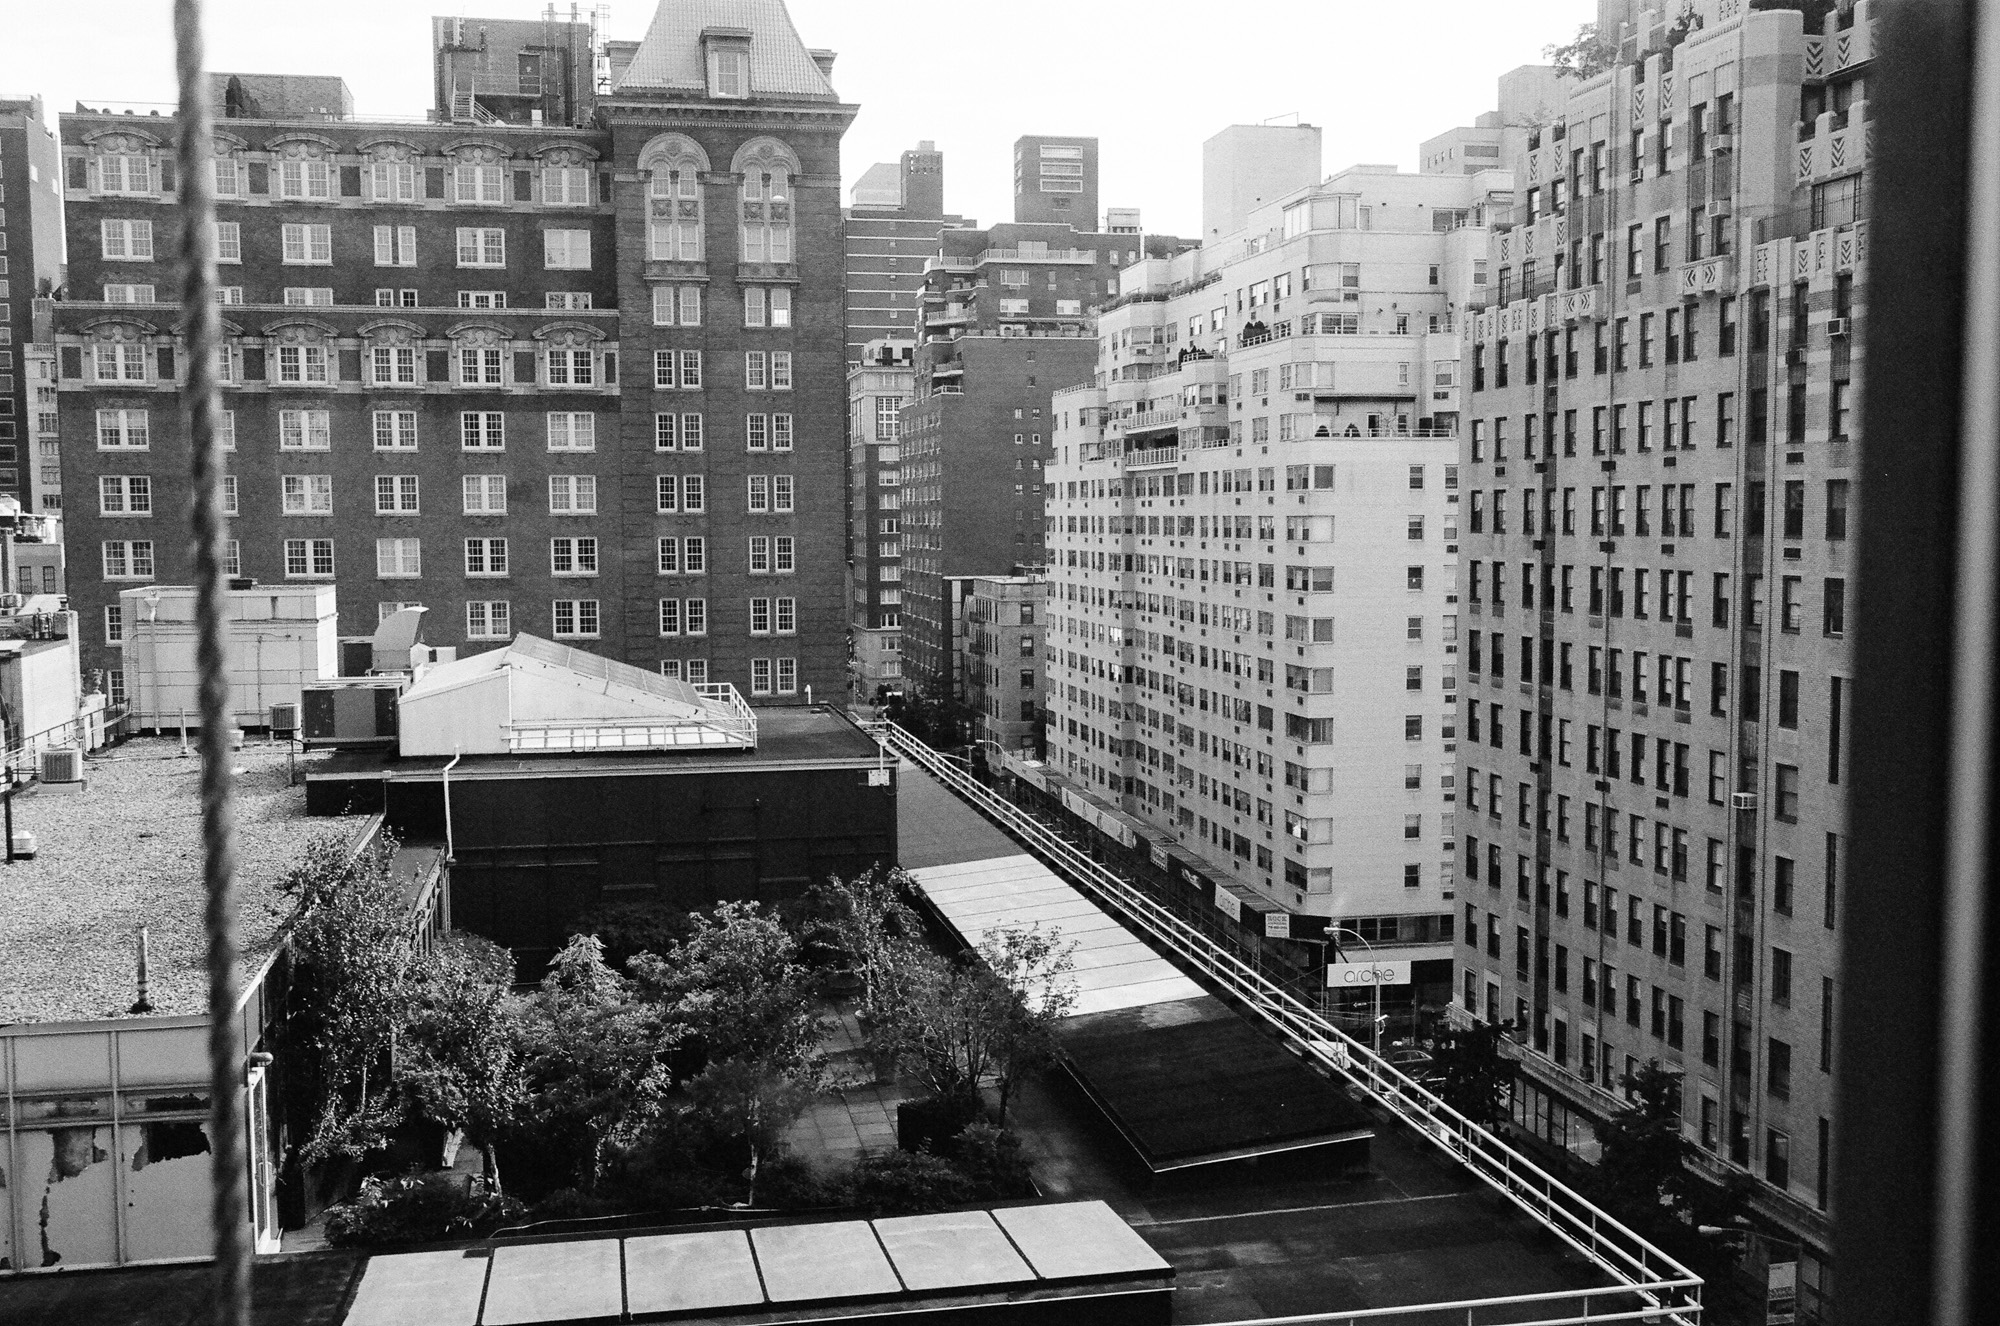 NEWYORK2013_©kristinmyoung_SQUARELORES-1.jpg